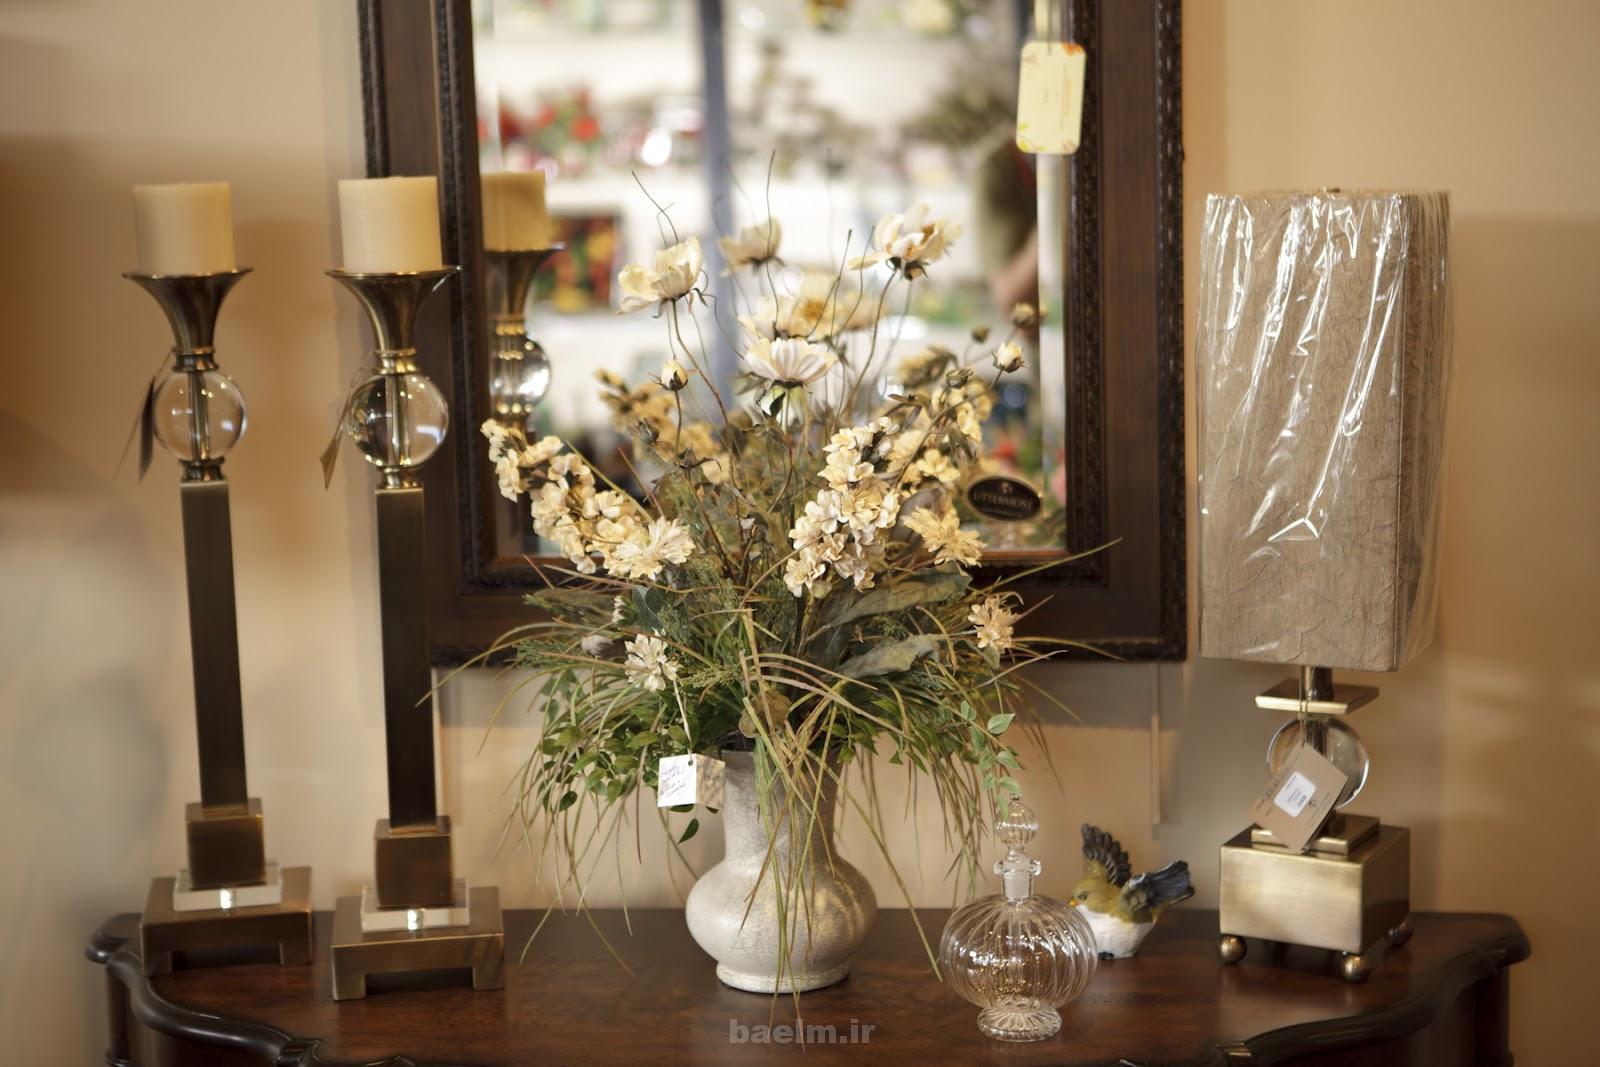 decorative accessories 11 Decorative Accessories